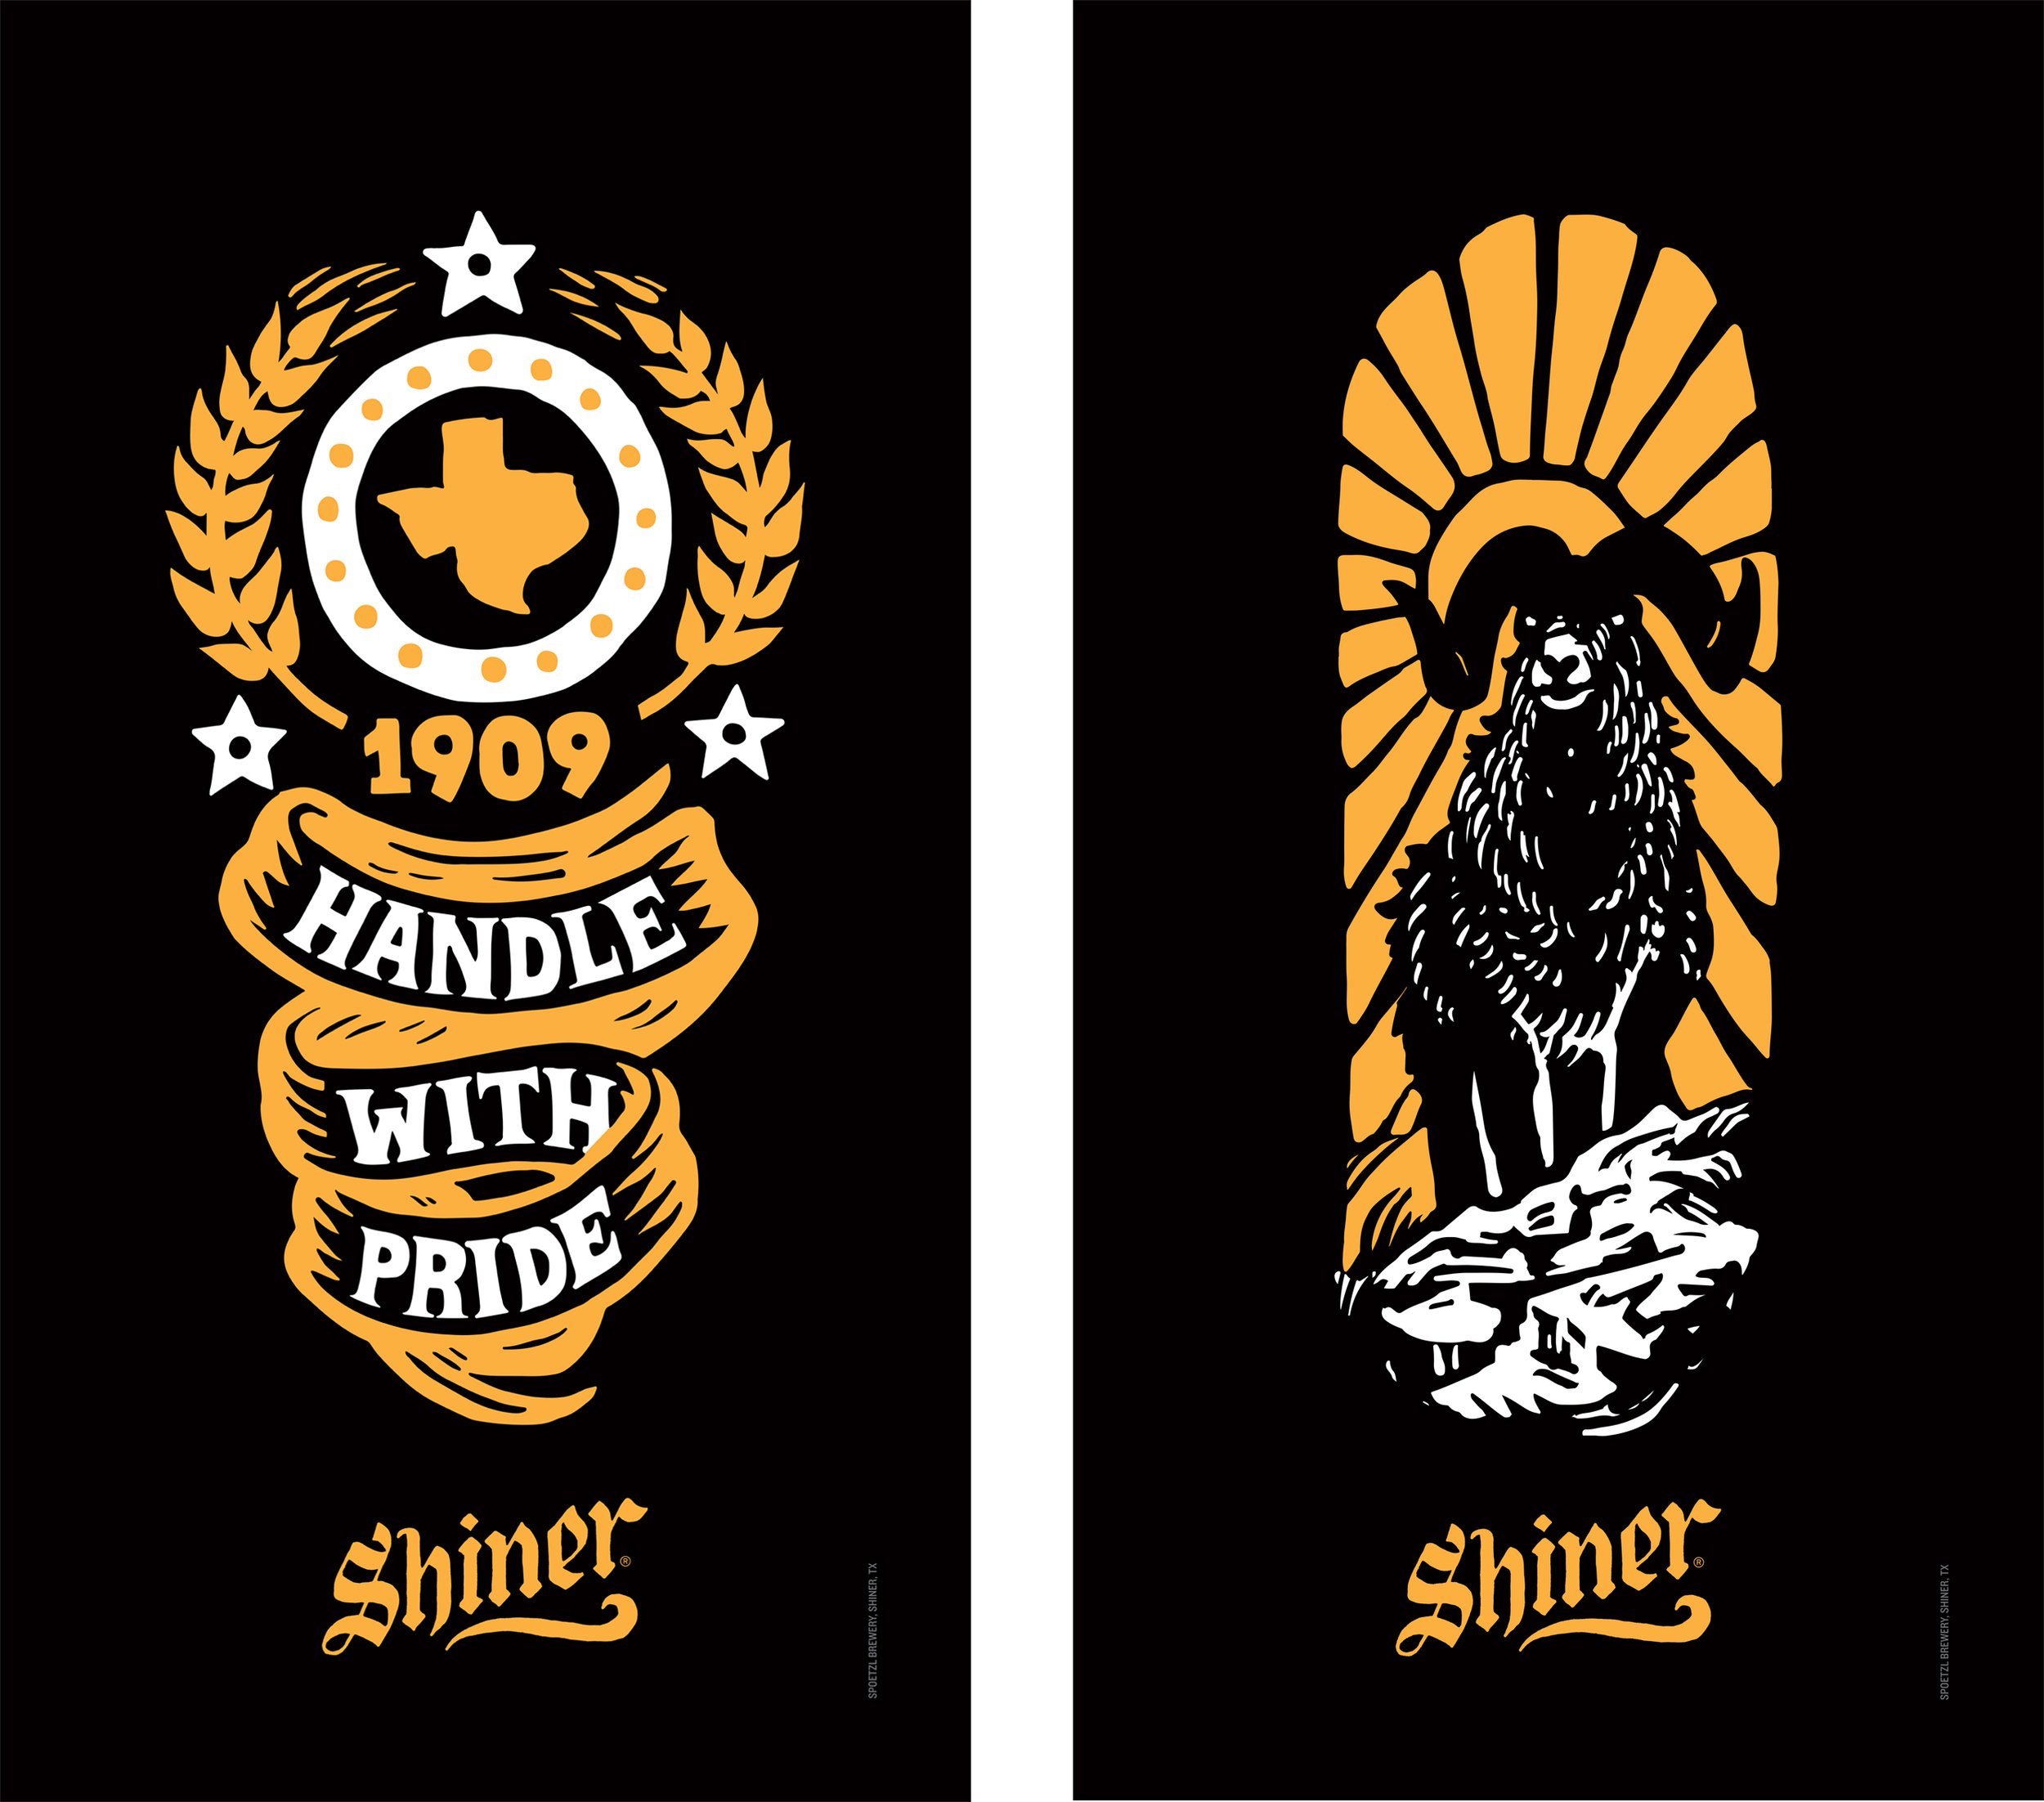 shiner-banners2.jpg